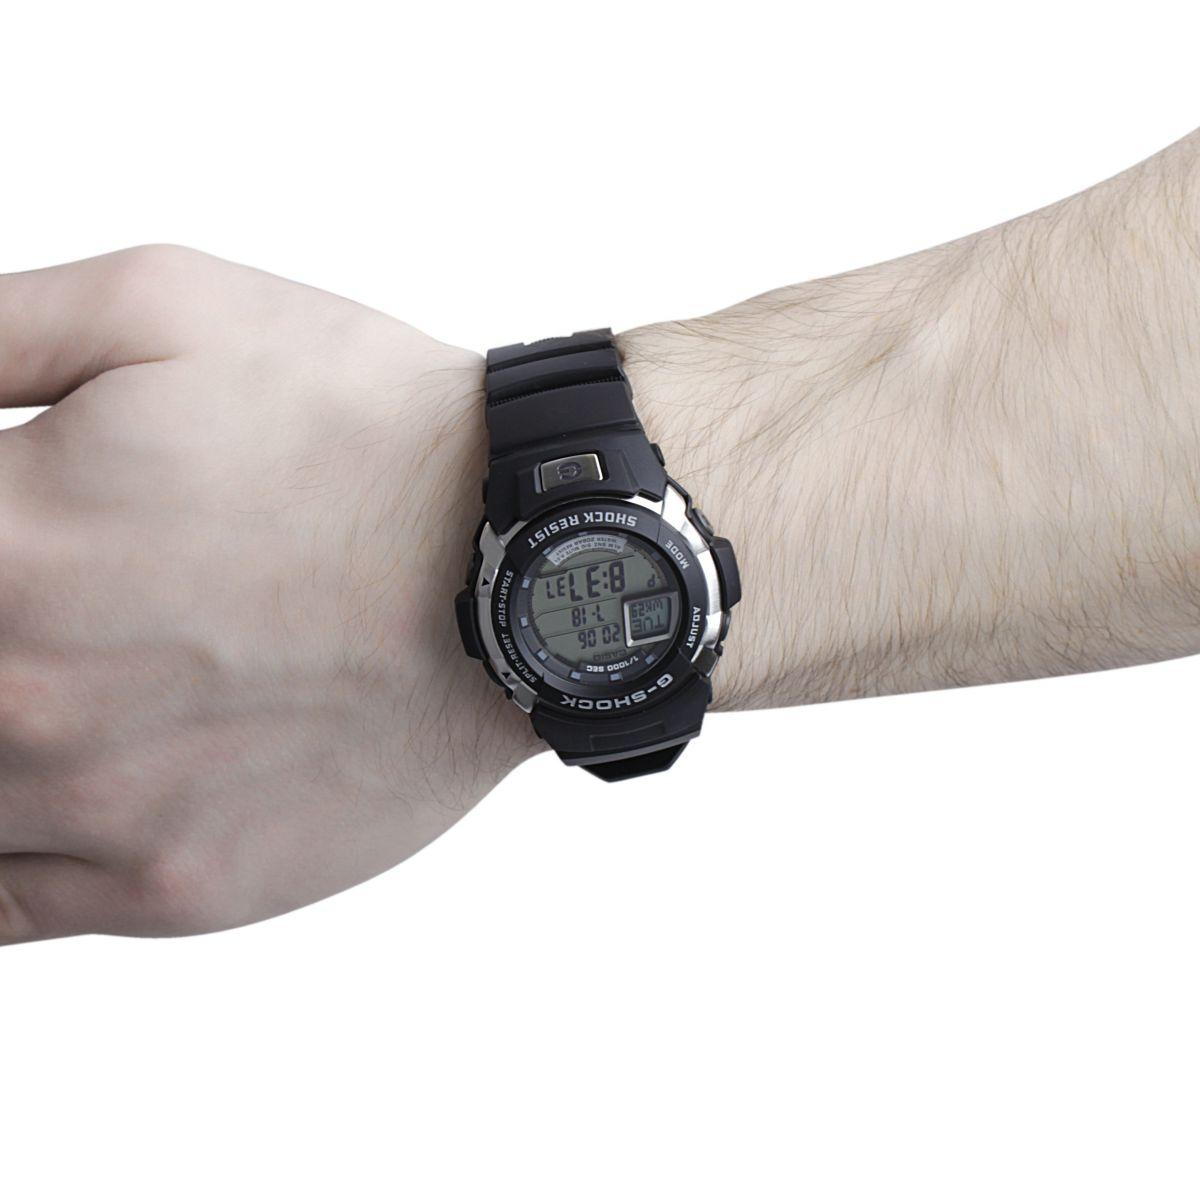 herren casio g shock wecker chronograf uhr g 7700 1er. Black Bedroom Furniture Sets. Home Design Ideas